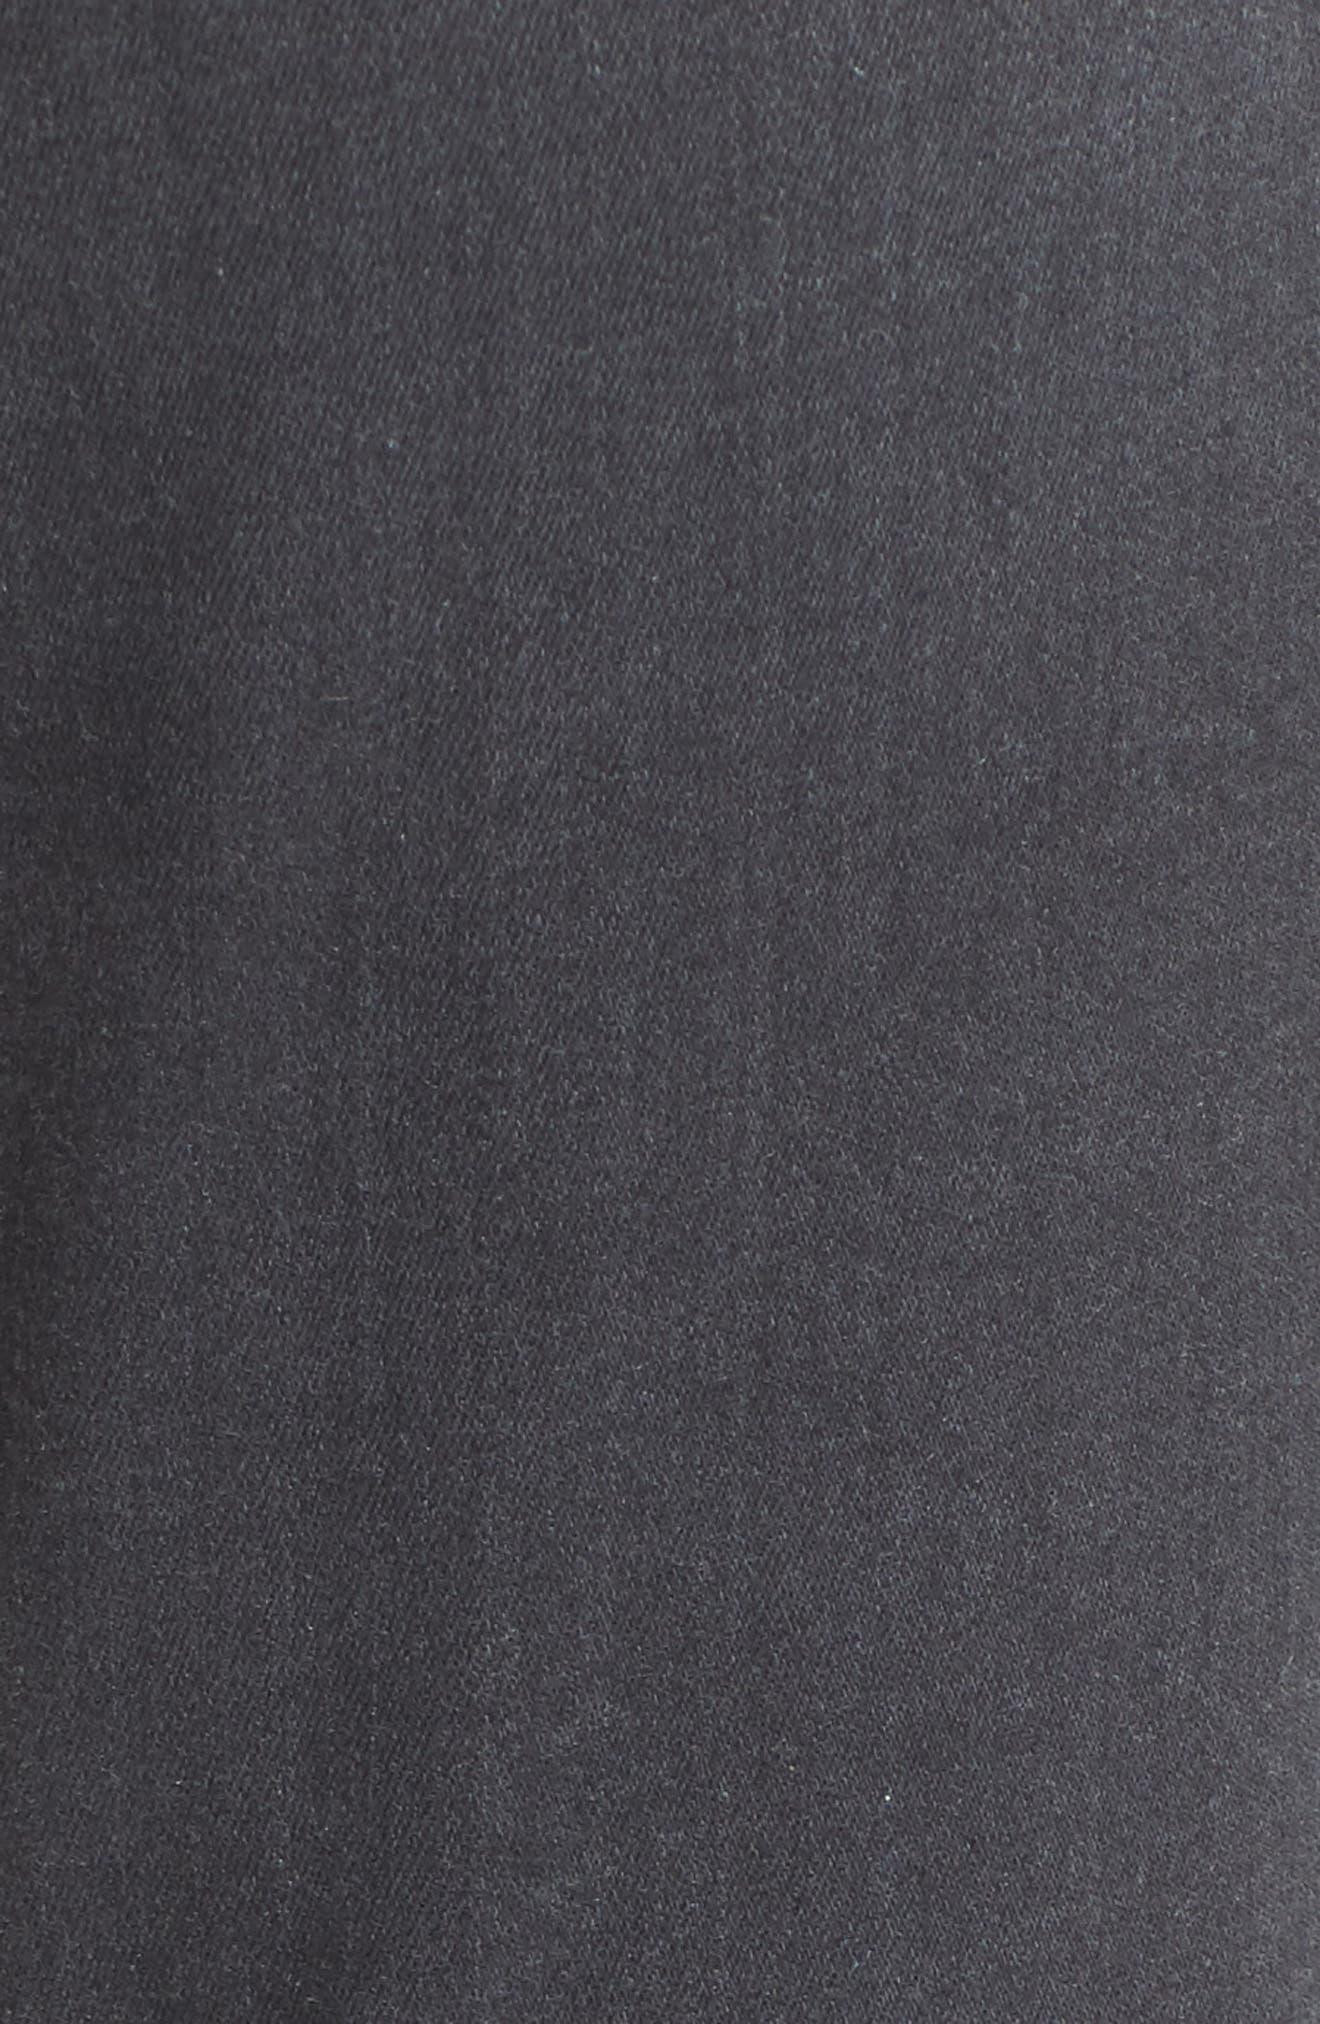 b(air) High Waist Skinny Jeans,                             Alternate thumbnail 6, color,                             B(Air) Smoke